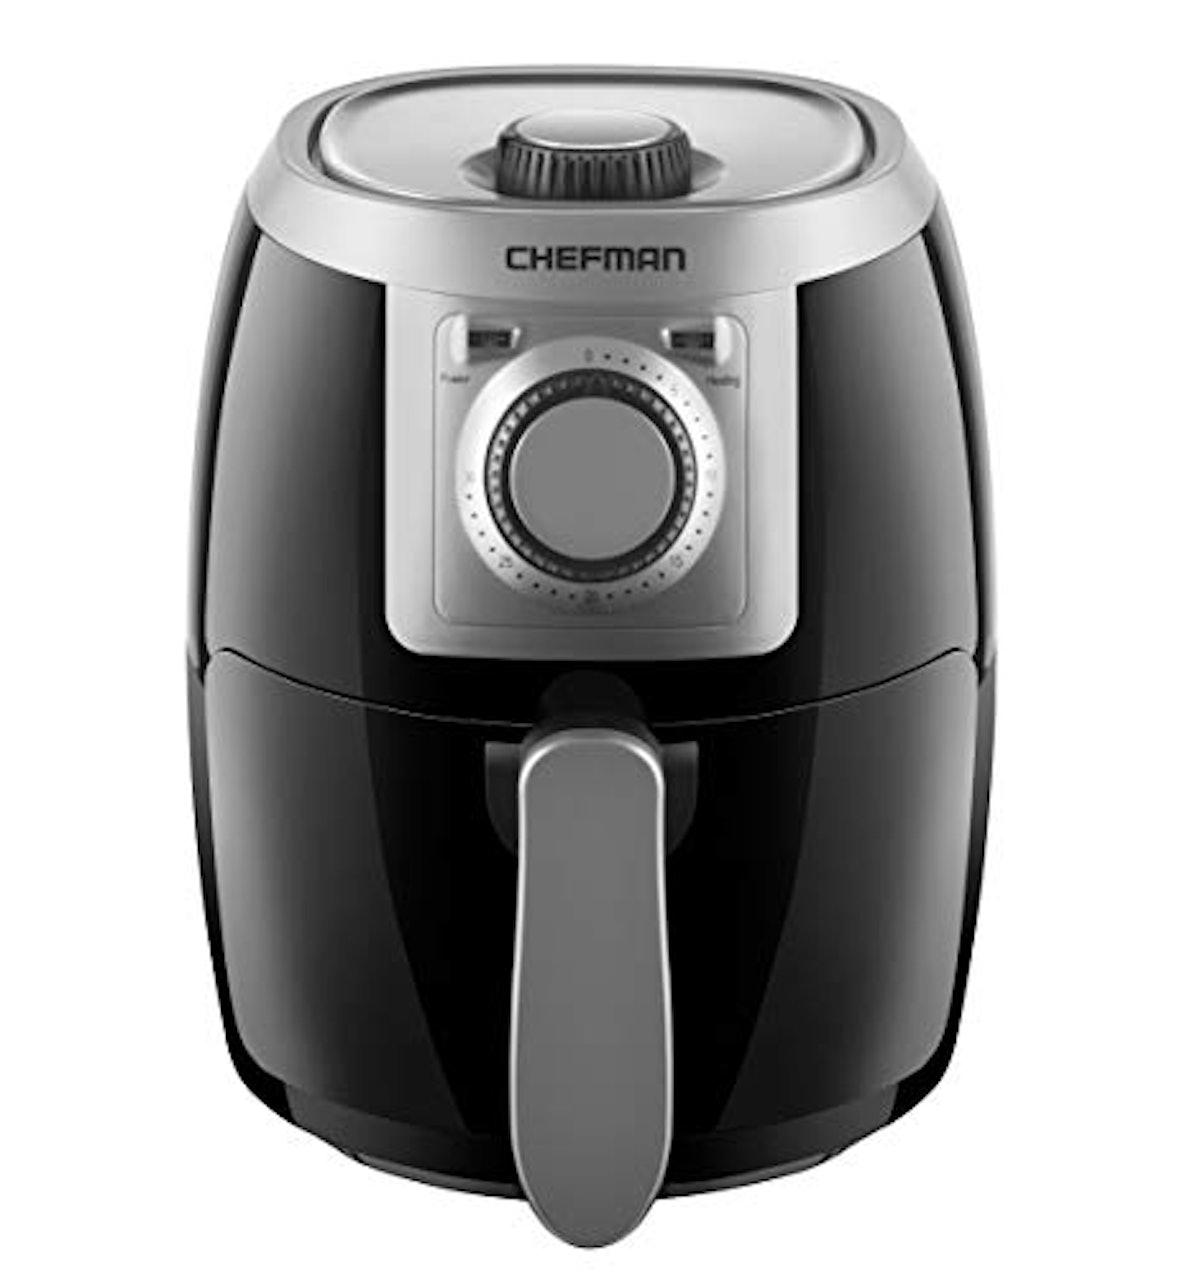 Chefman TurboFry 2 Quart Air Fryer